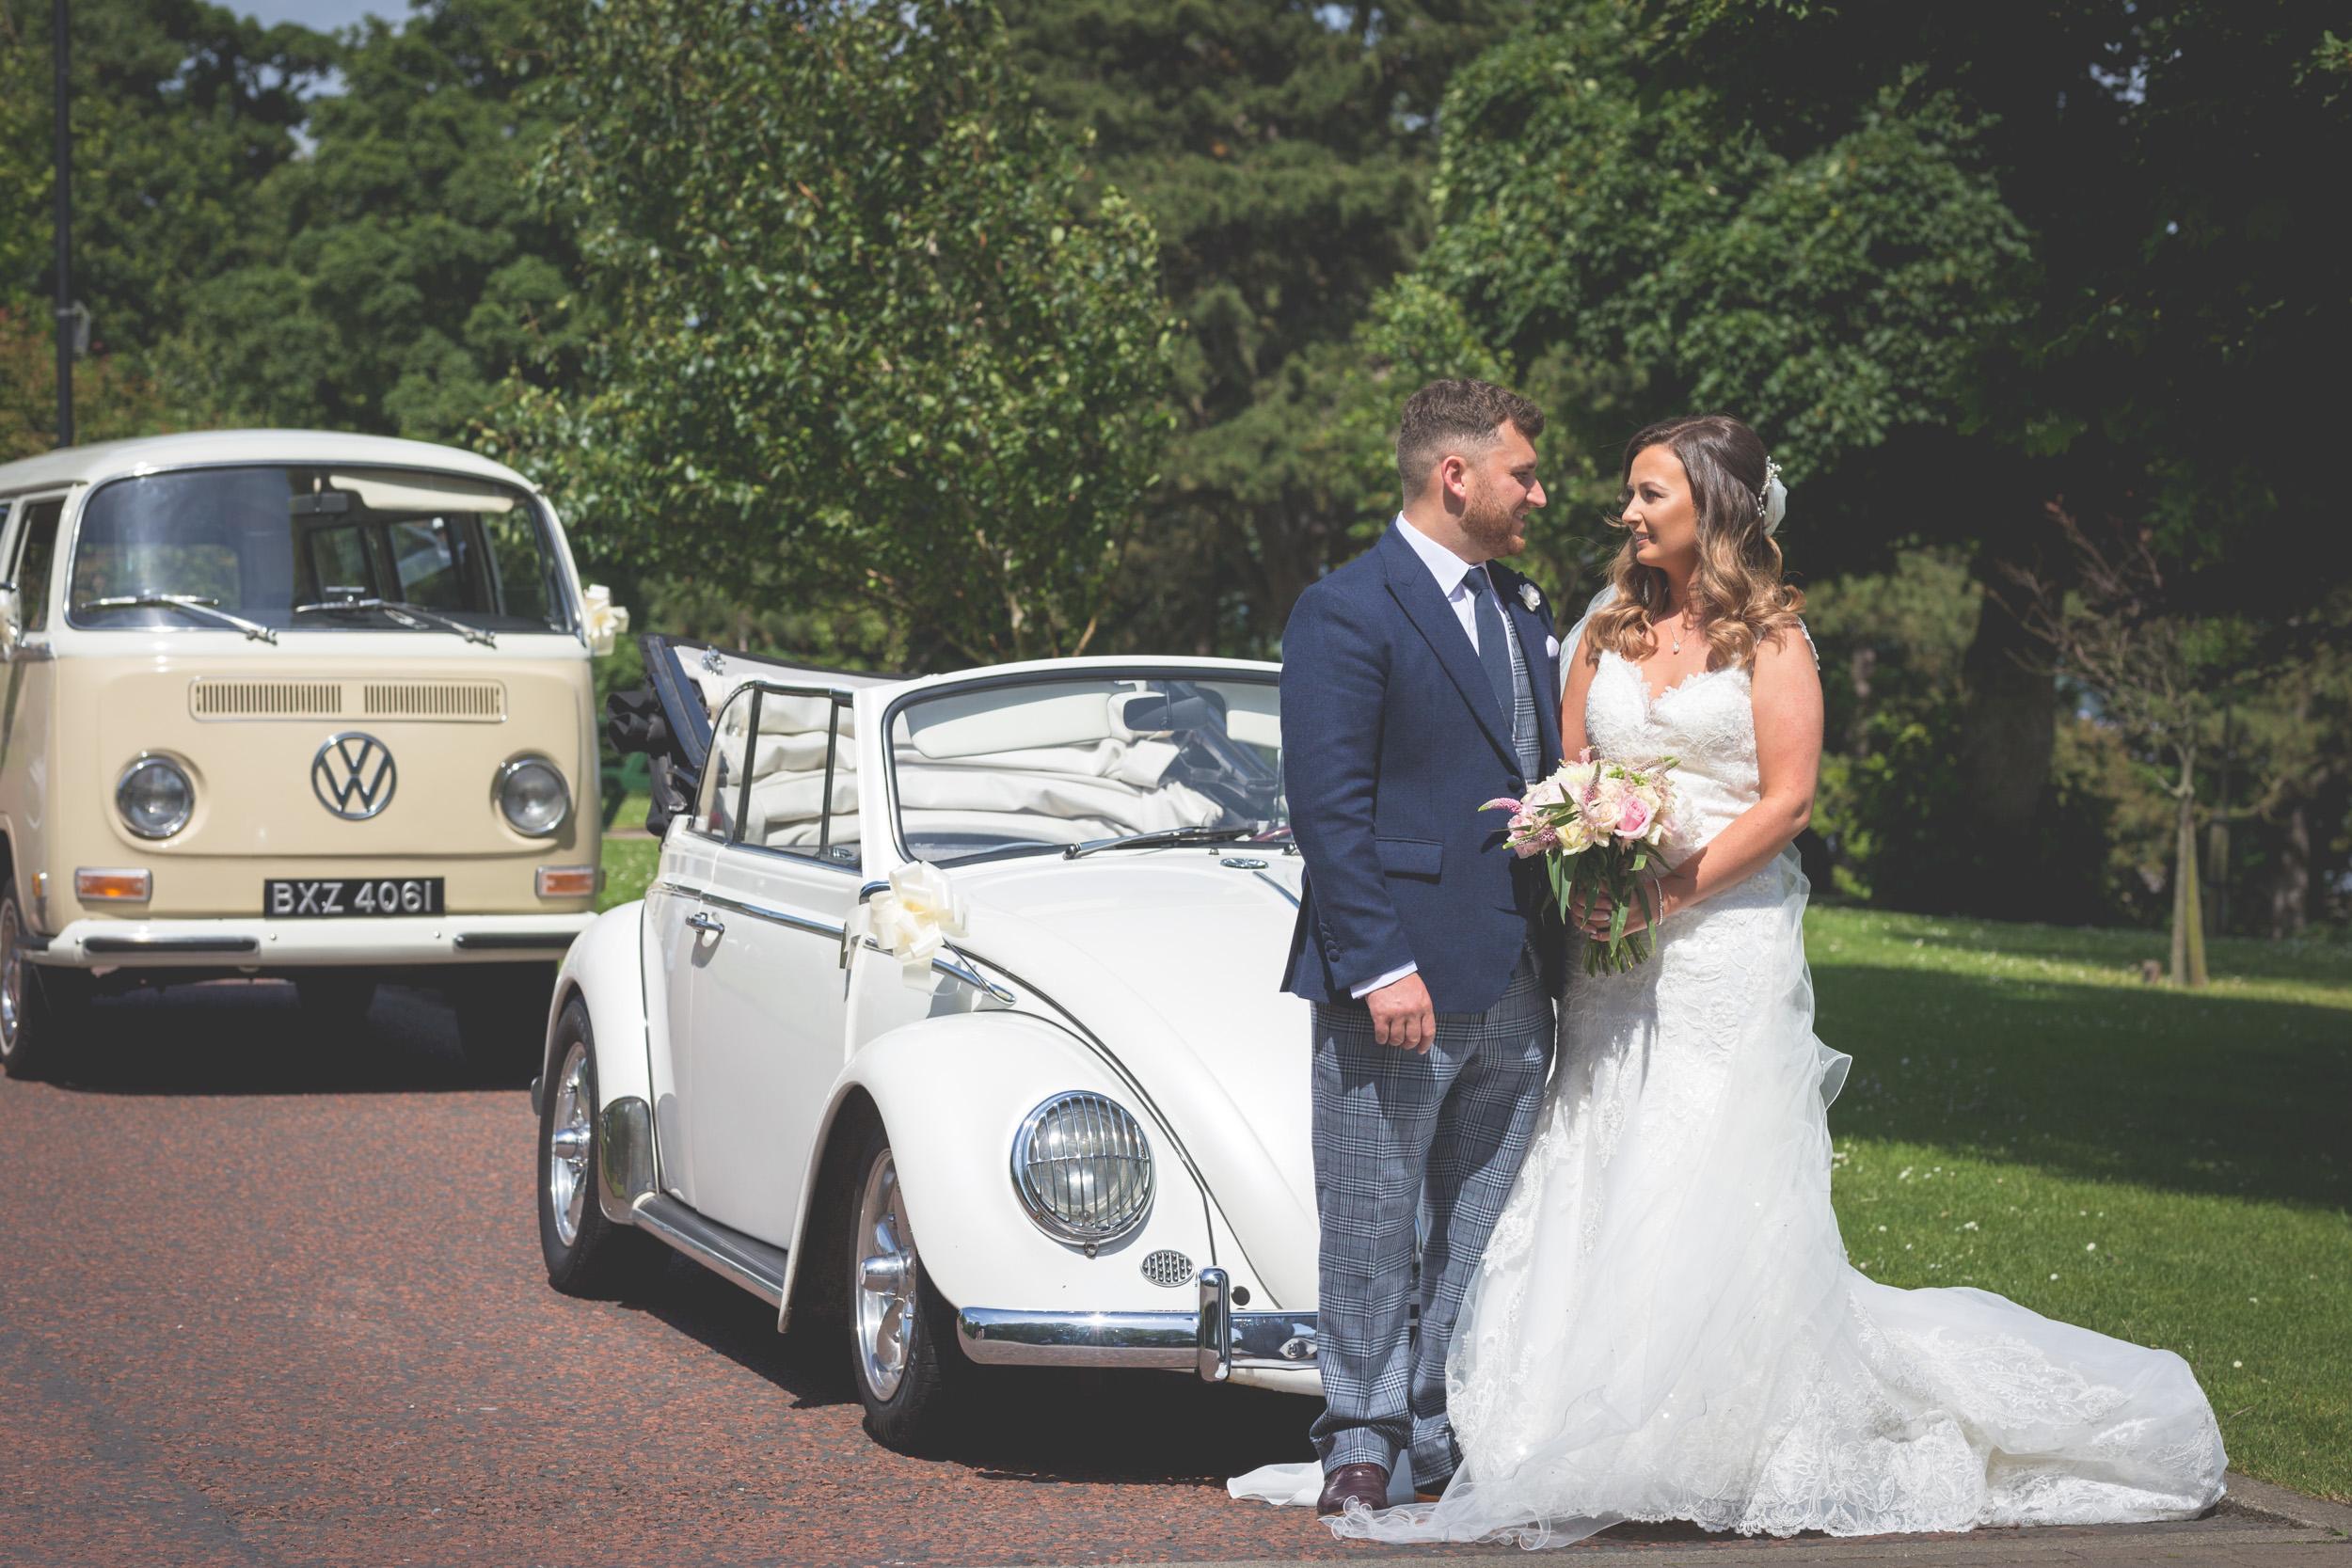 Brian McEwan   Northern Ireland Wedding Photographer   Rebecca & Michael   Portraits-14.jpg